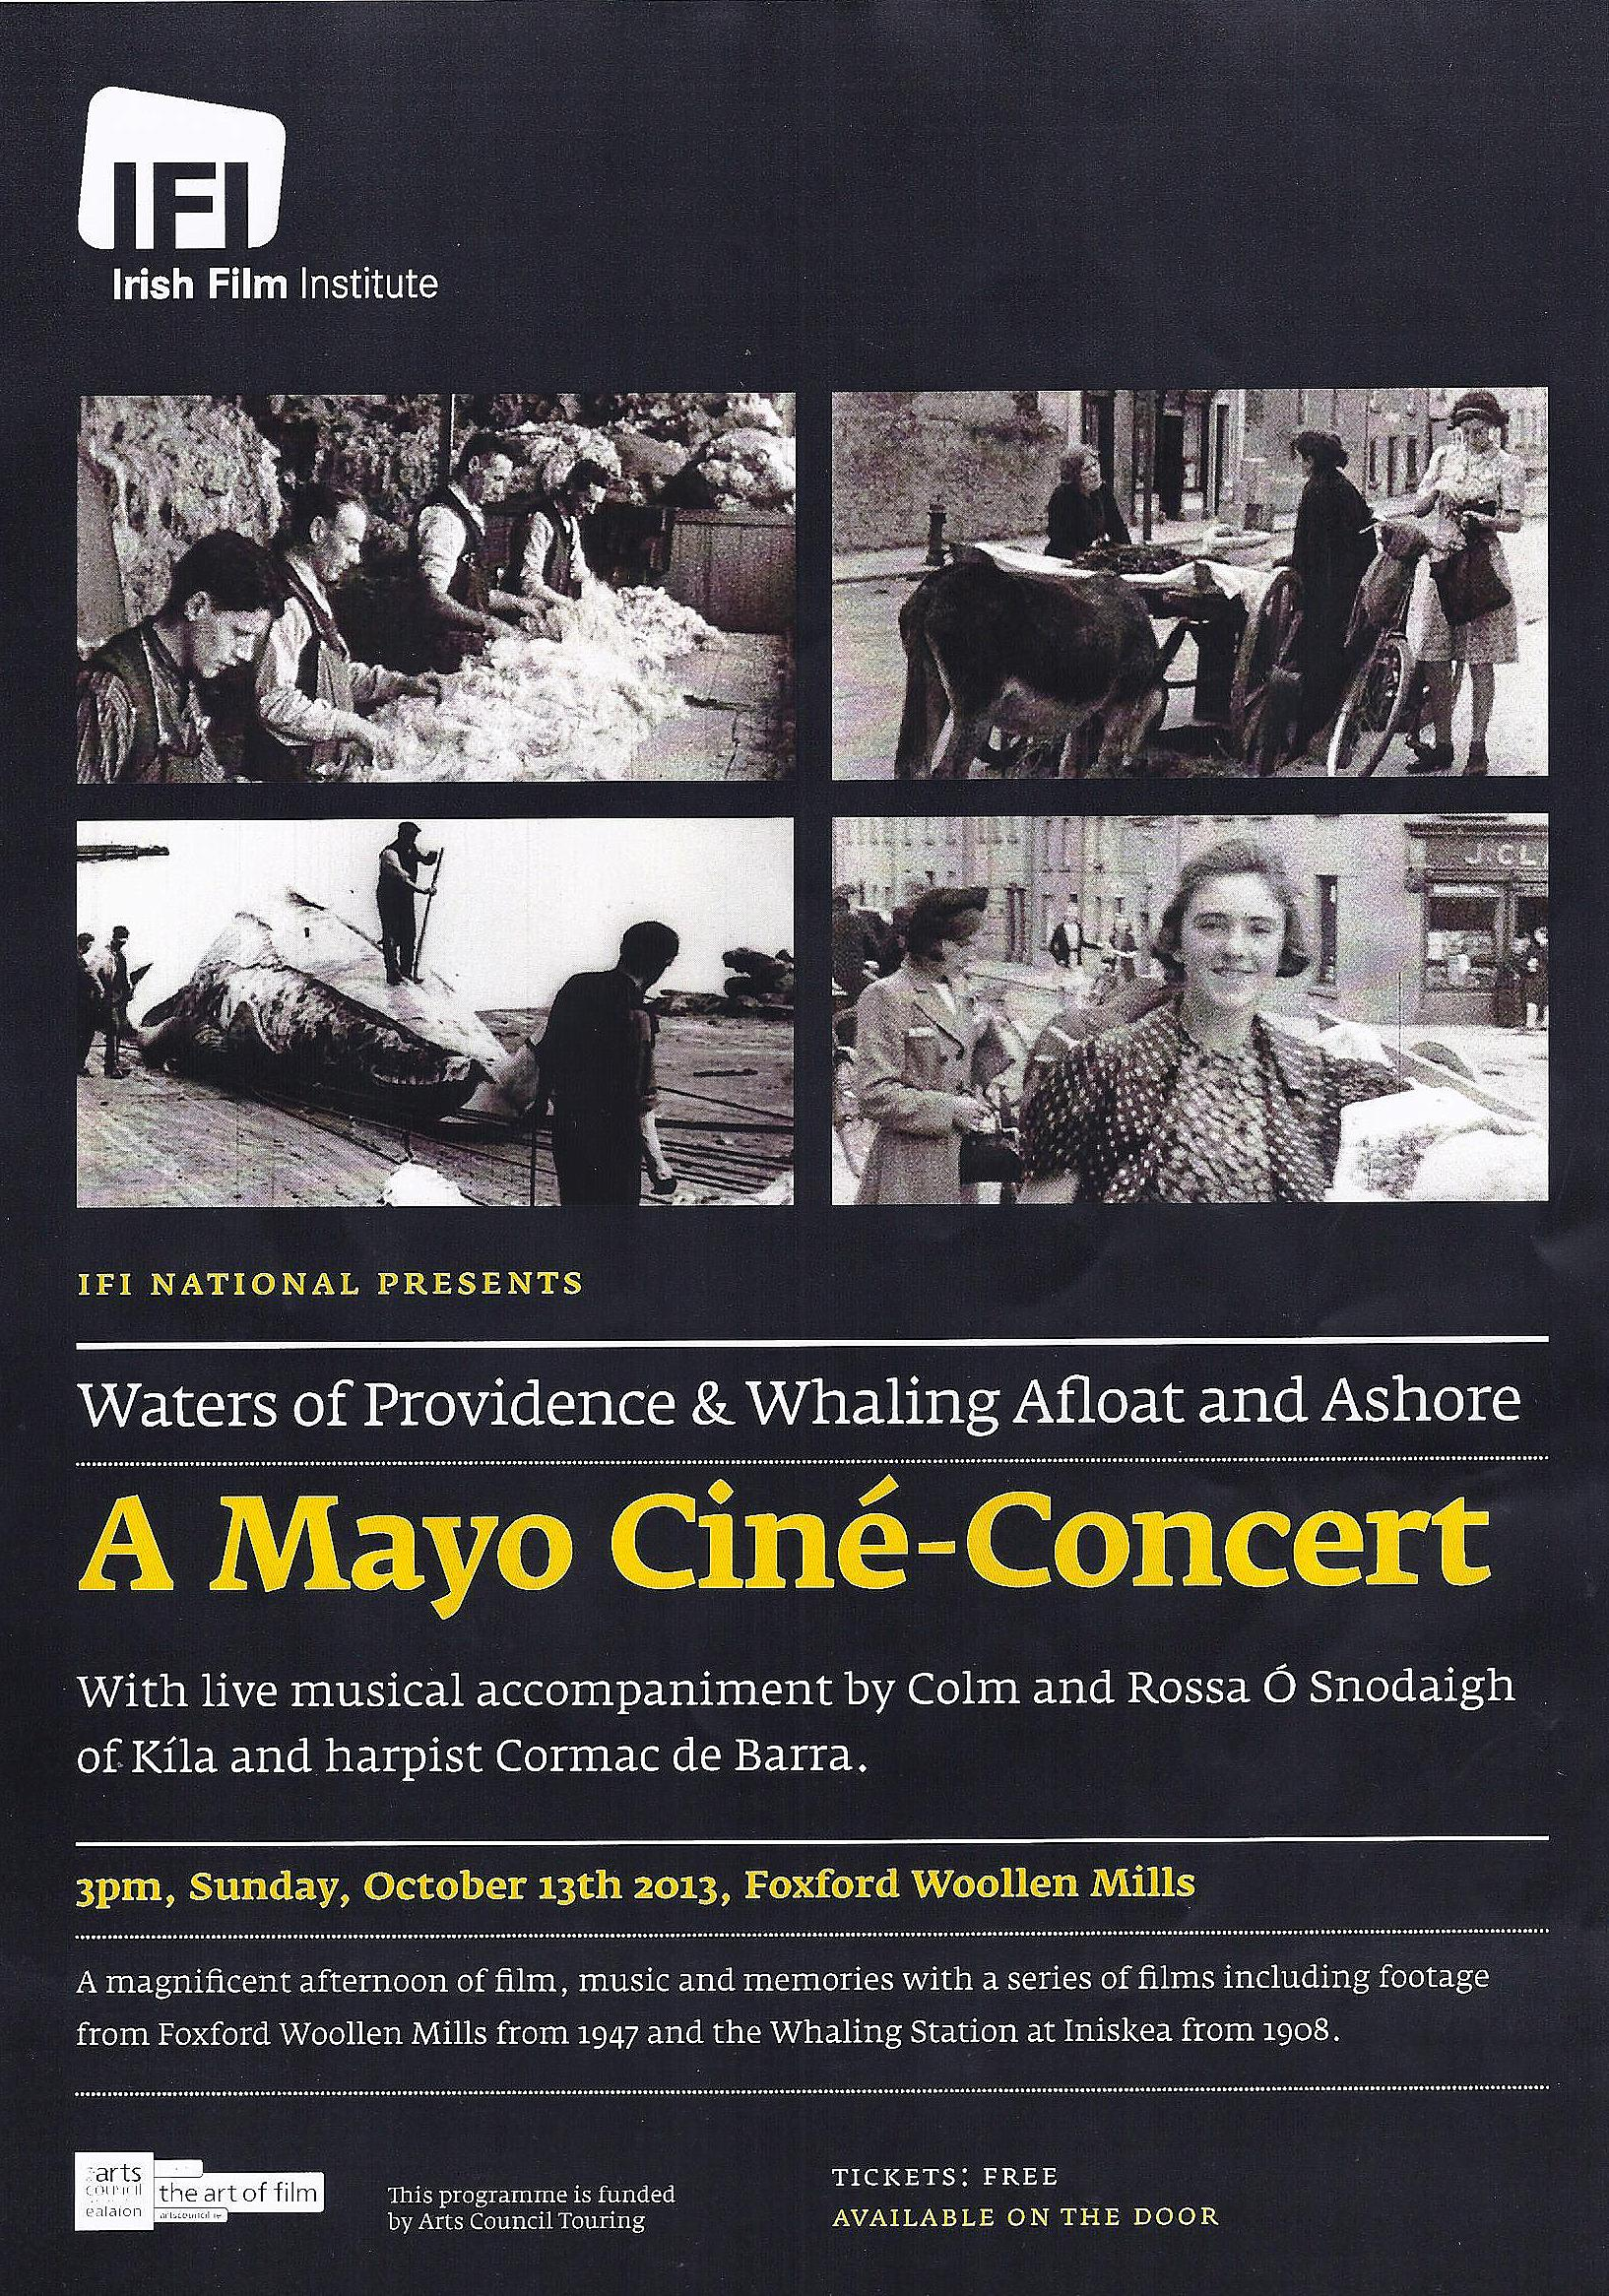 IFI_Mayo_Cine_Concert_Poster.jpg